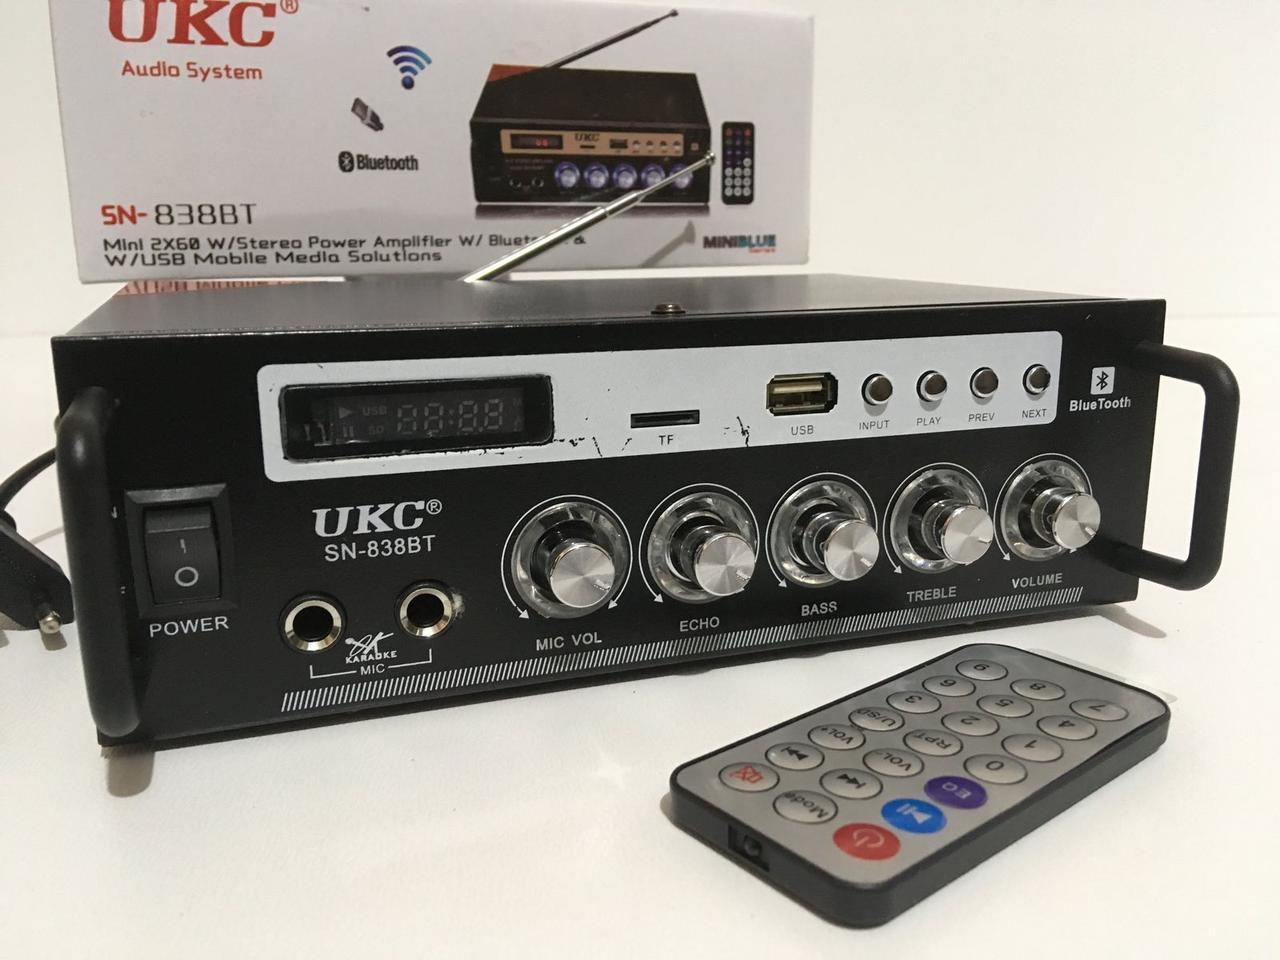 Усилитель звука UKC SN-838 BT USB, SD, AUX, Bluetooth, караоке, пульт